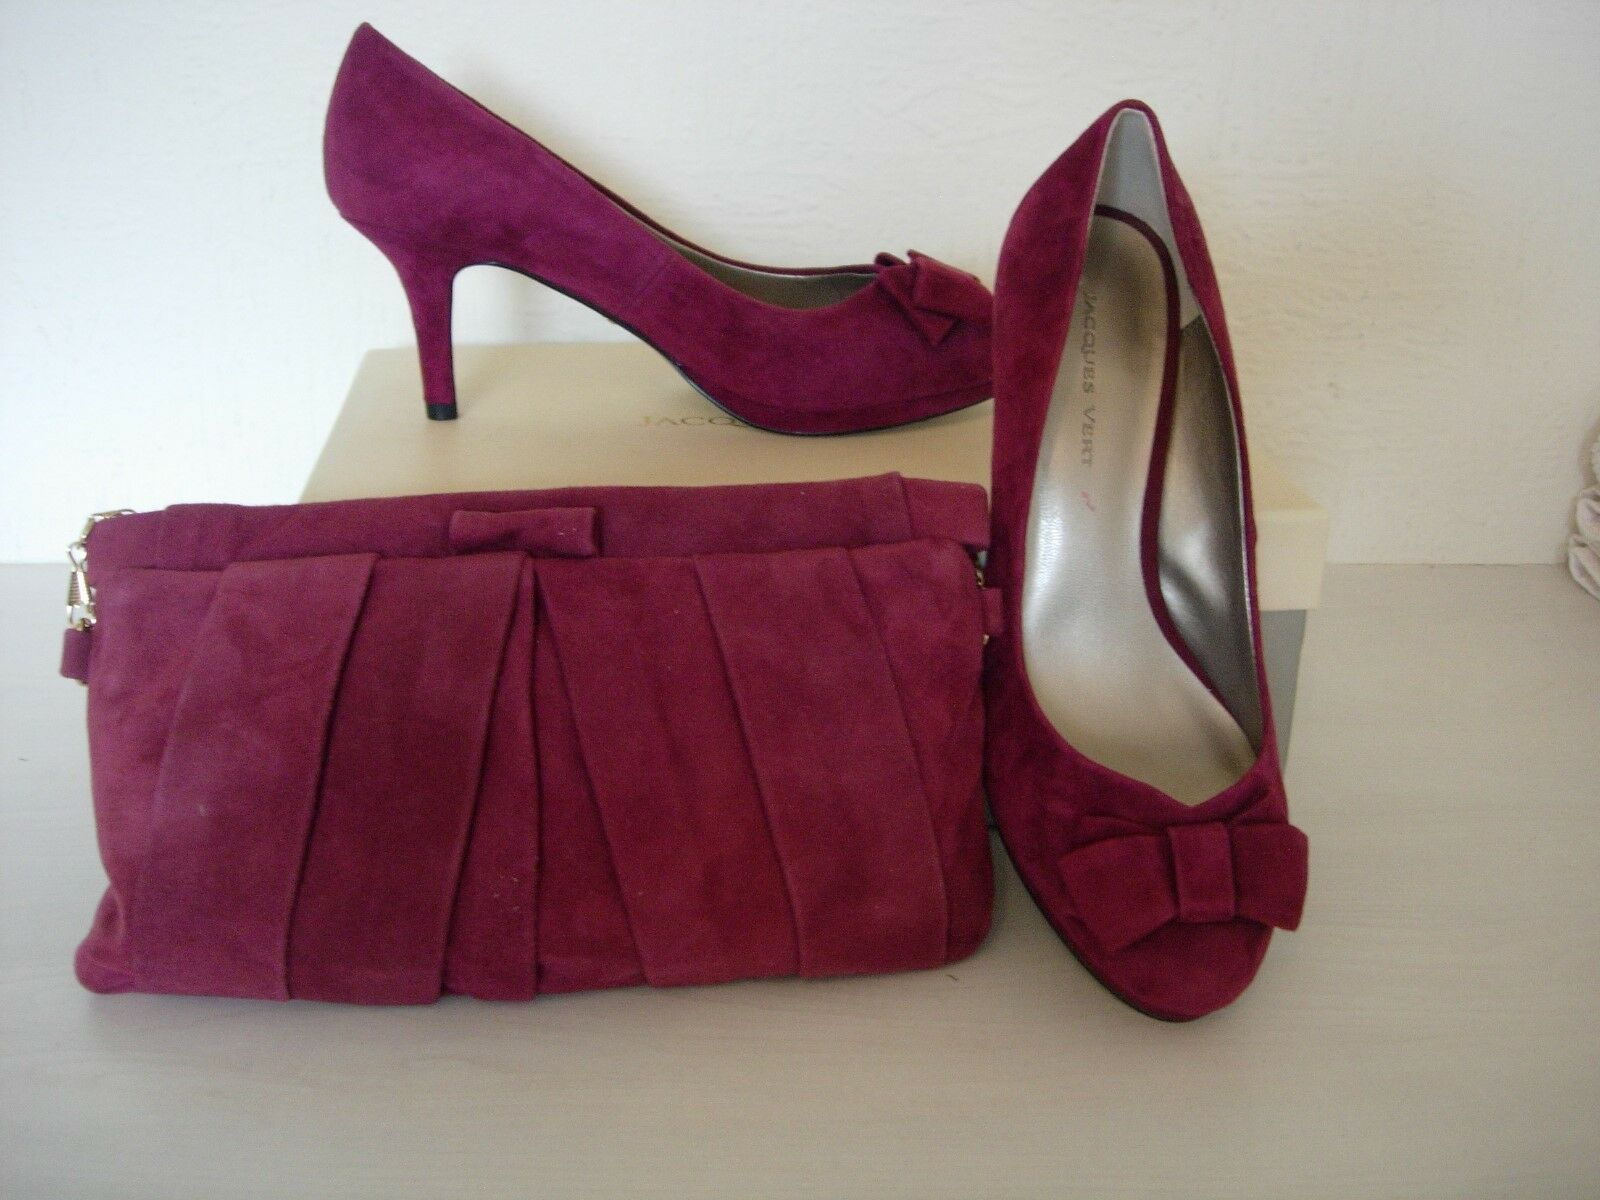 Jacques verde Zapatos Zapatos Zapatos De Gamuza Y BOLSO A JUEGO-Rojo Oscuro Talla 4-Nuevo  popular